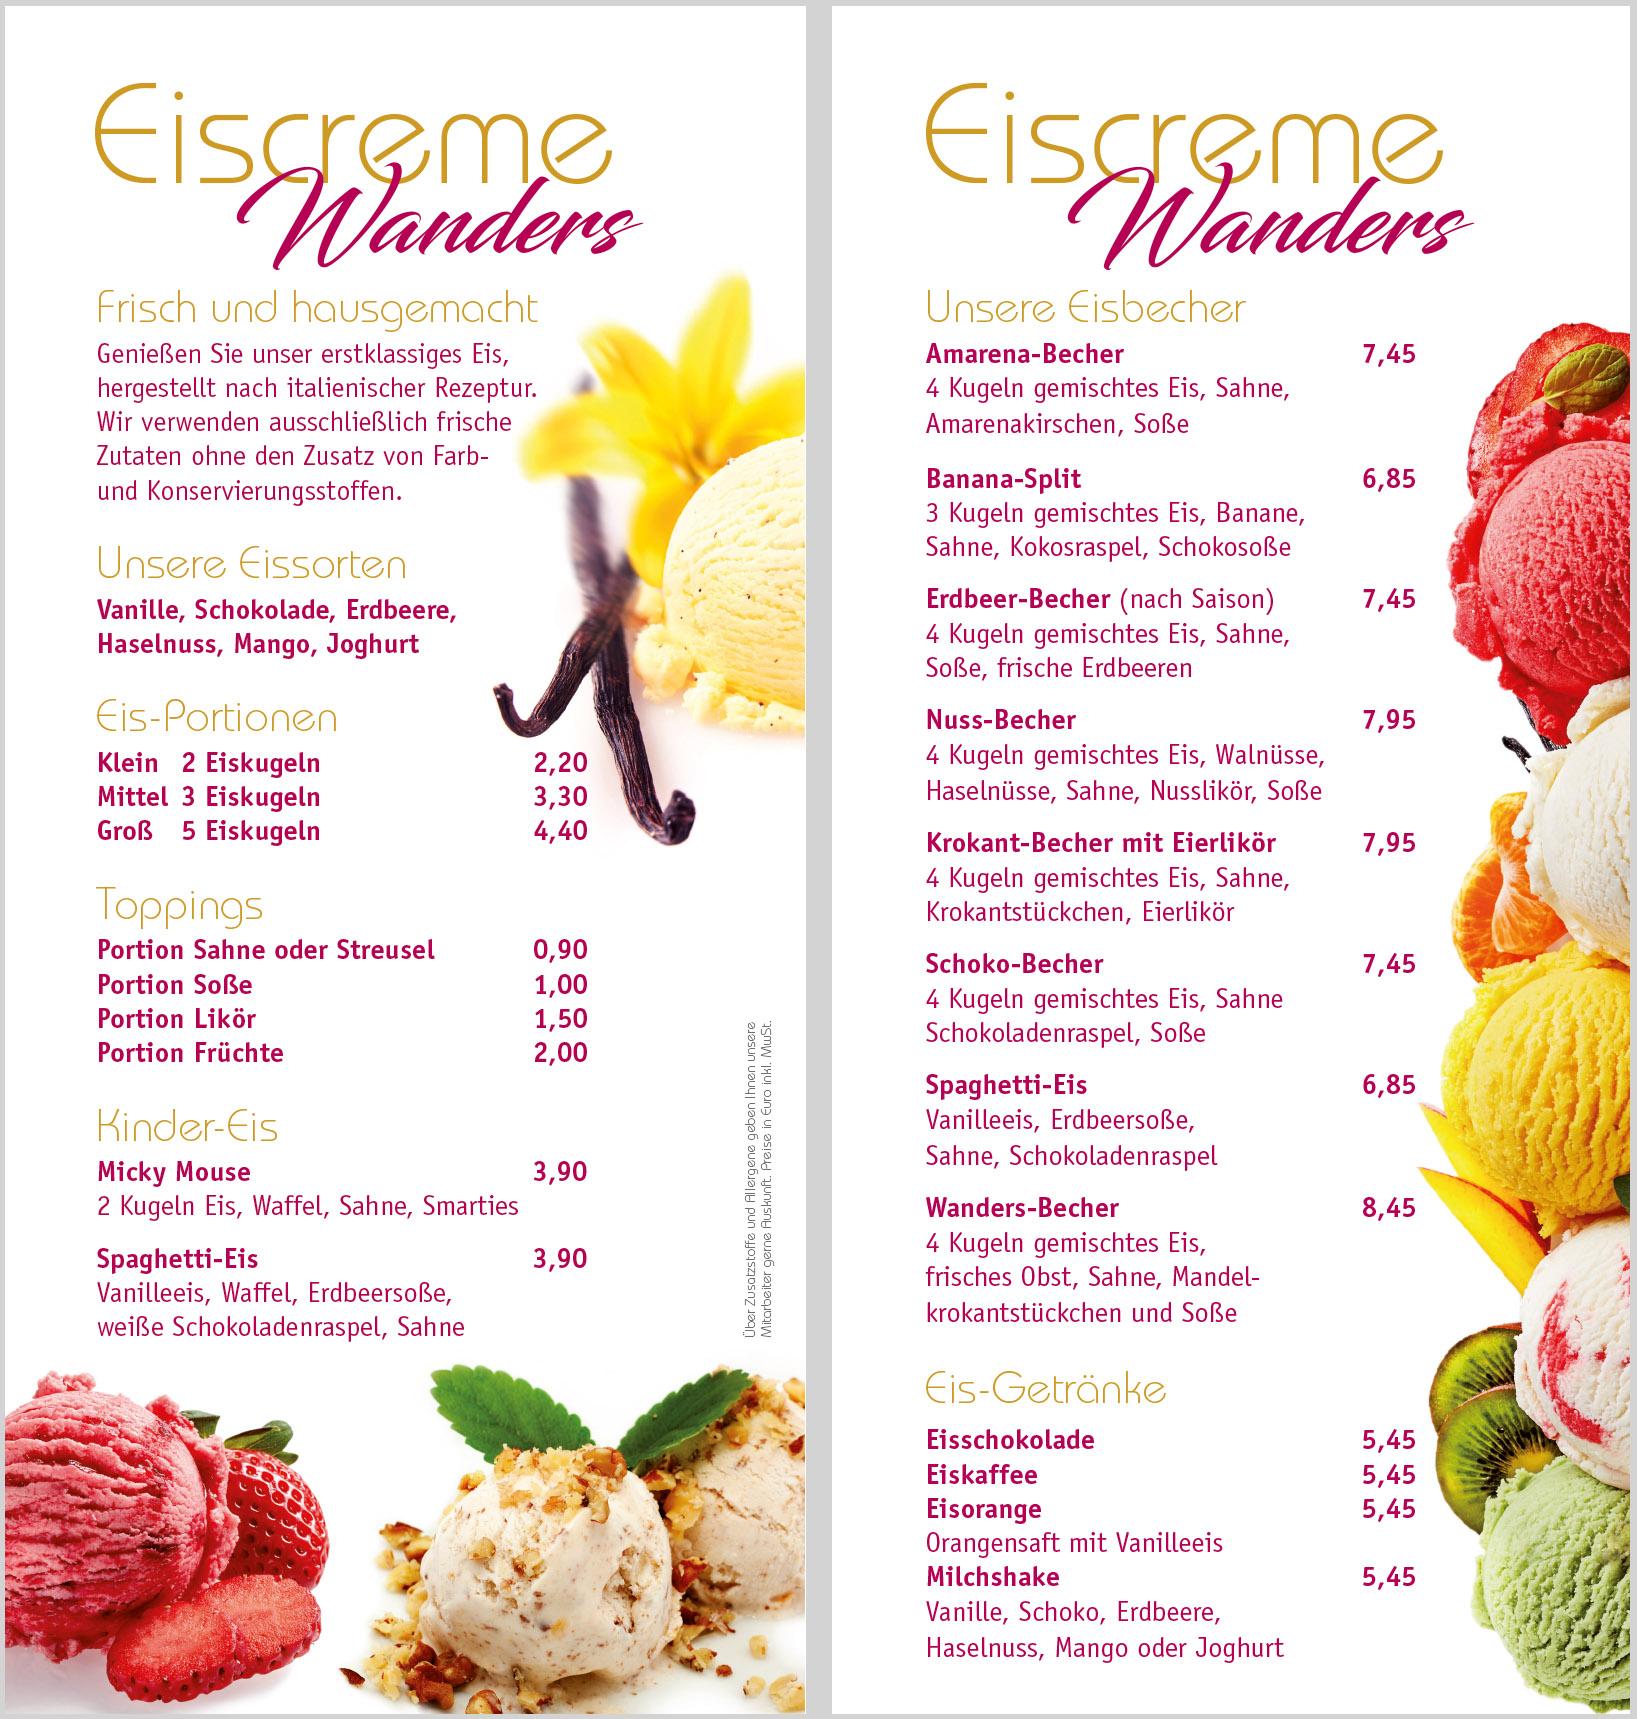 Eis Eiskarte Stadt Café Wanders Kleve